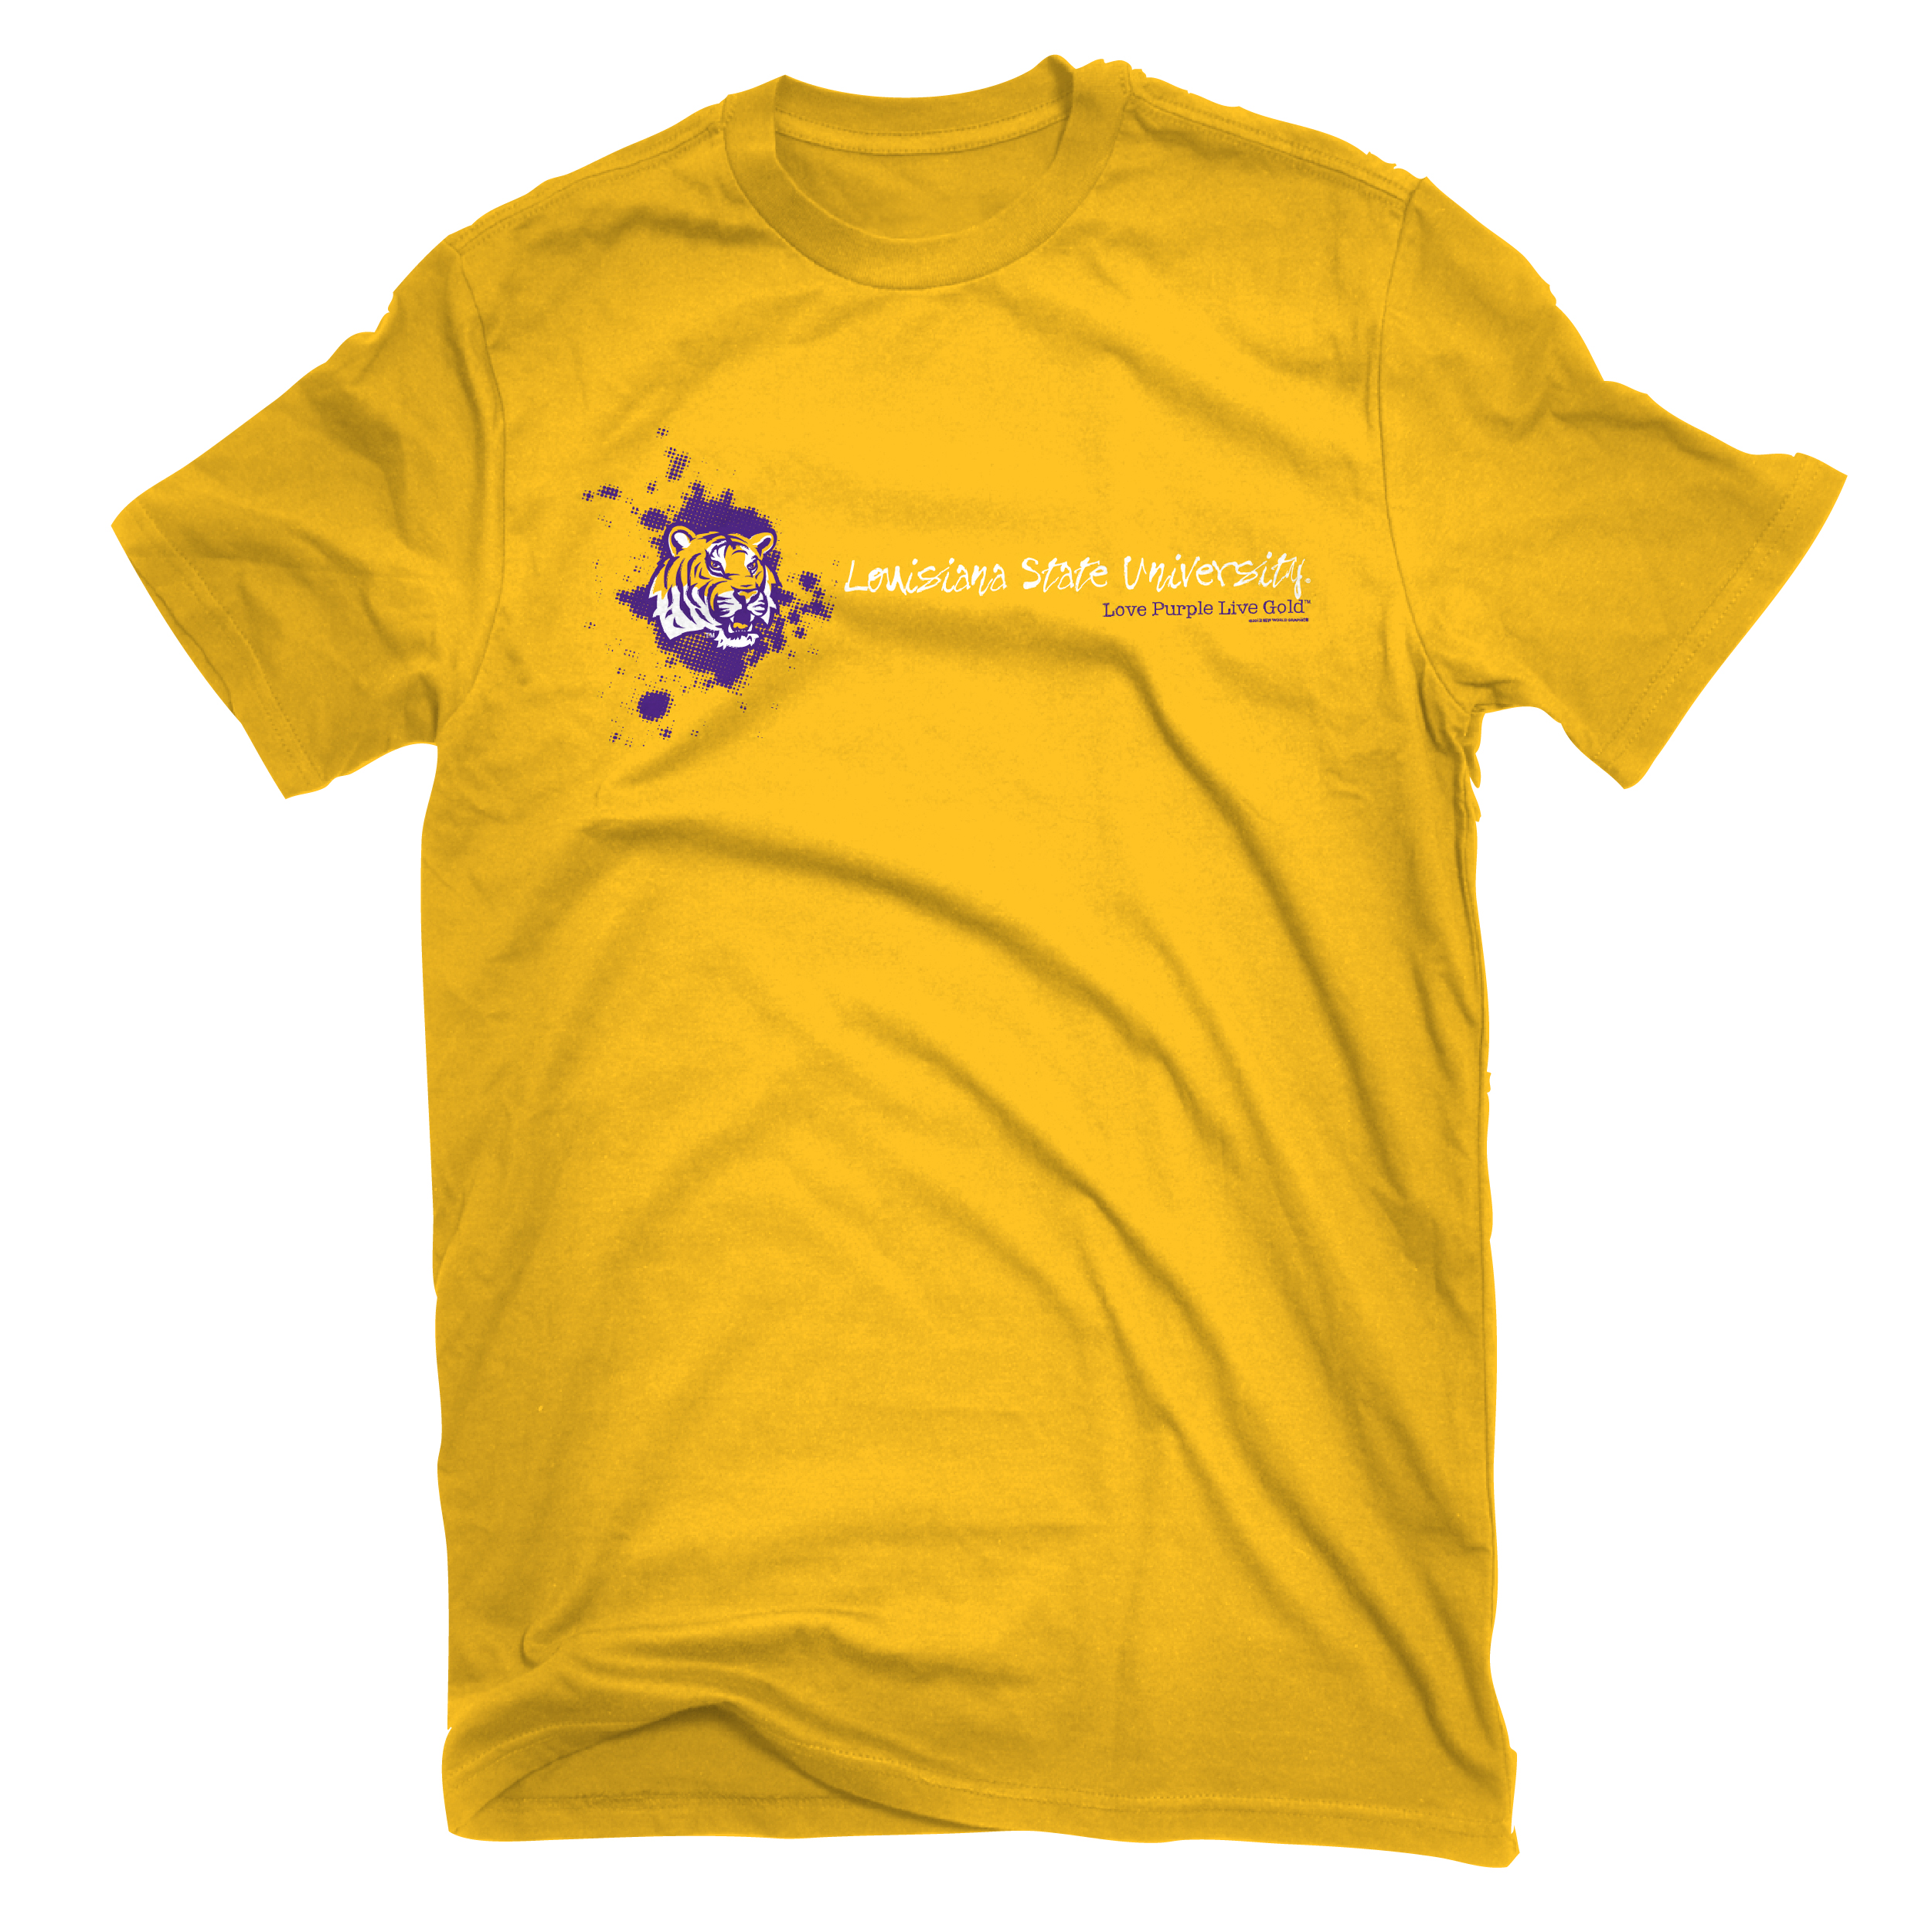 LSU shirt-01.jpg